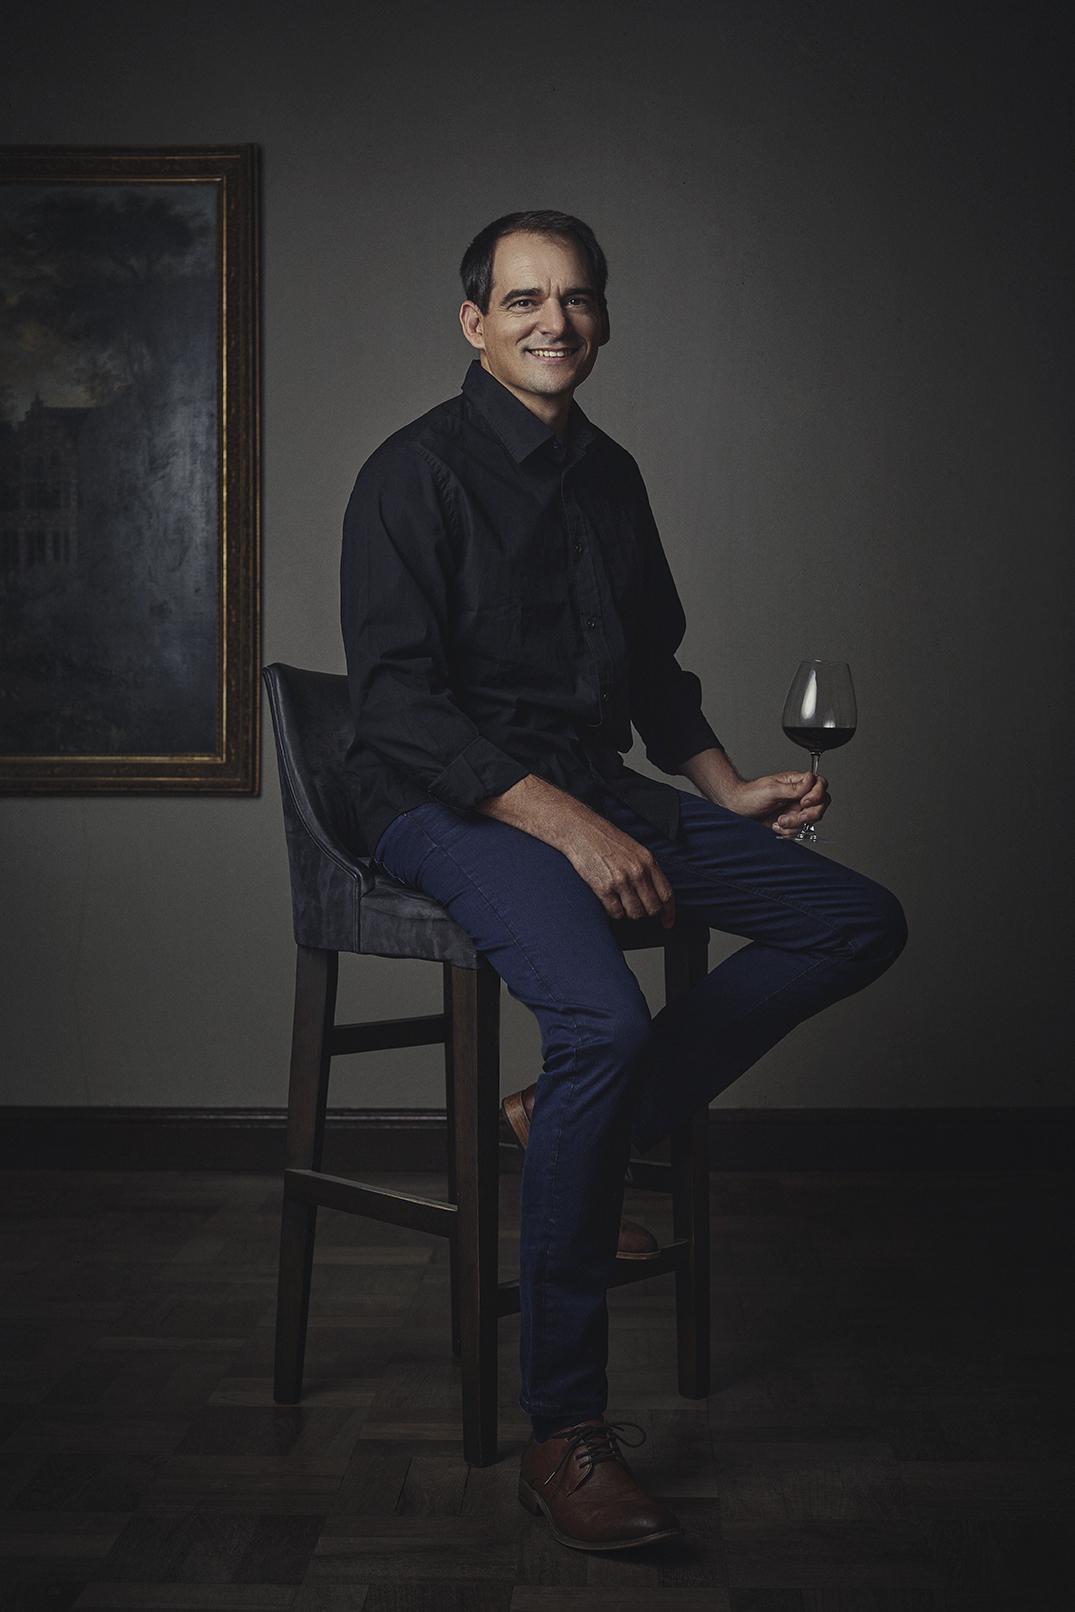 Seasoned Winemaker Samuel Viljoen Takes Over The Reins At Nederburg photo